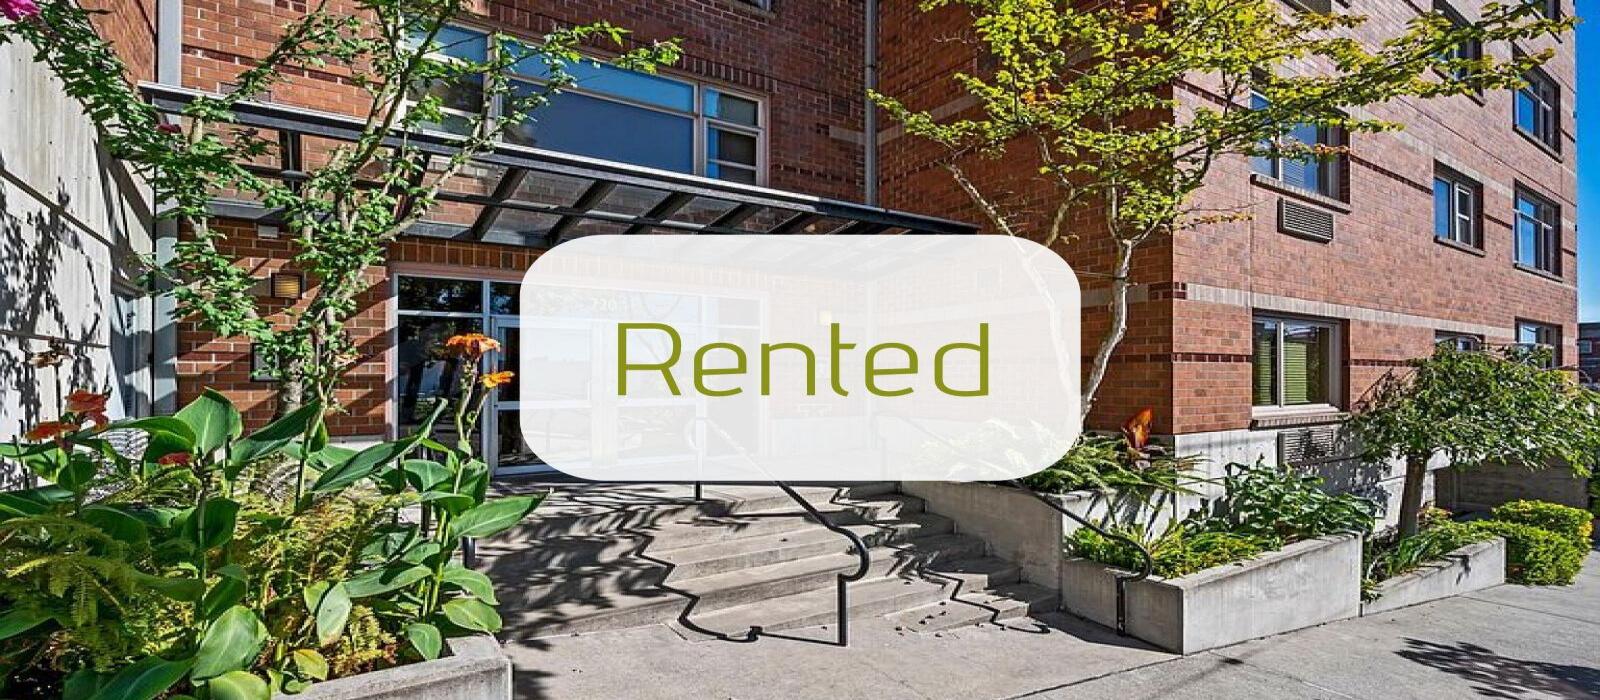 720 Queen Anne Ave N APT 306, Seattle, Washington 98109, 2 Bedrooms Bedrooms, ,1.5 BathroomsBathrooms,Condominium,For Rent,Queen Anne Ave N APT 306,1048